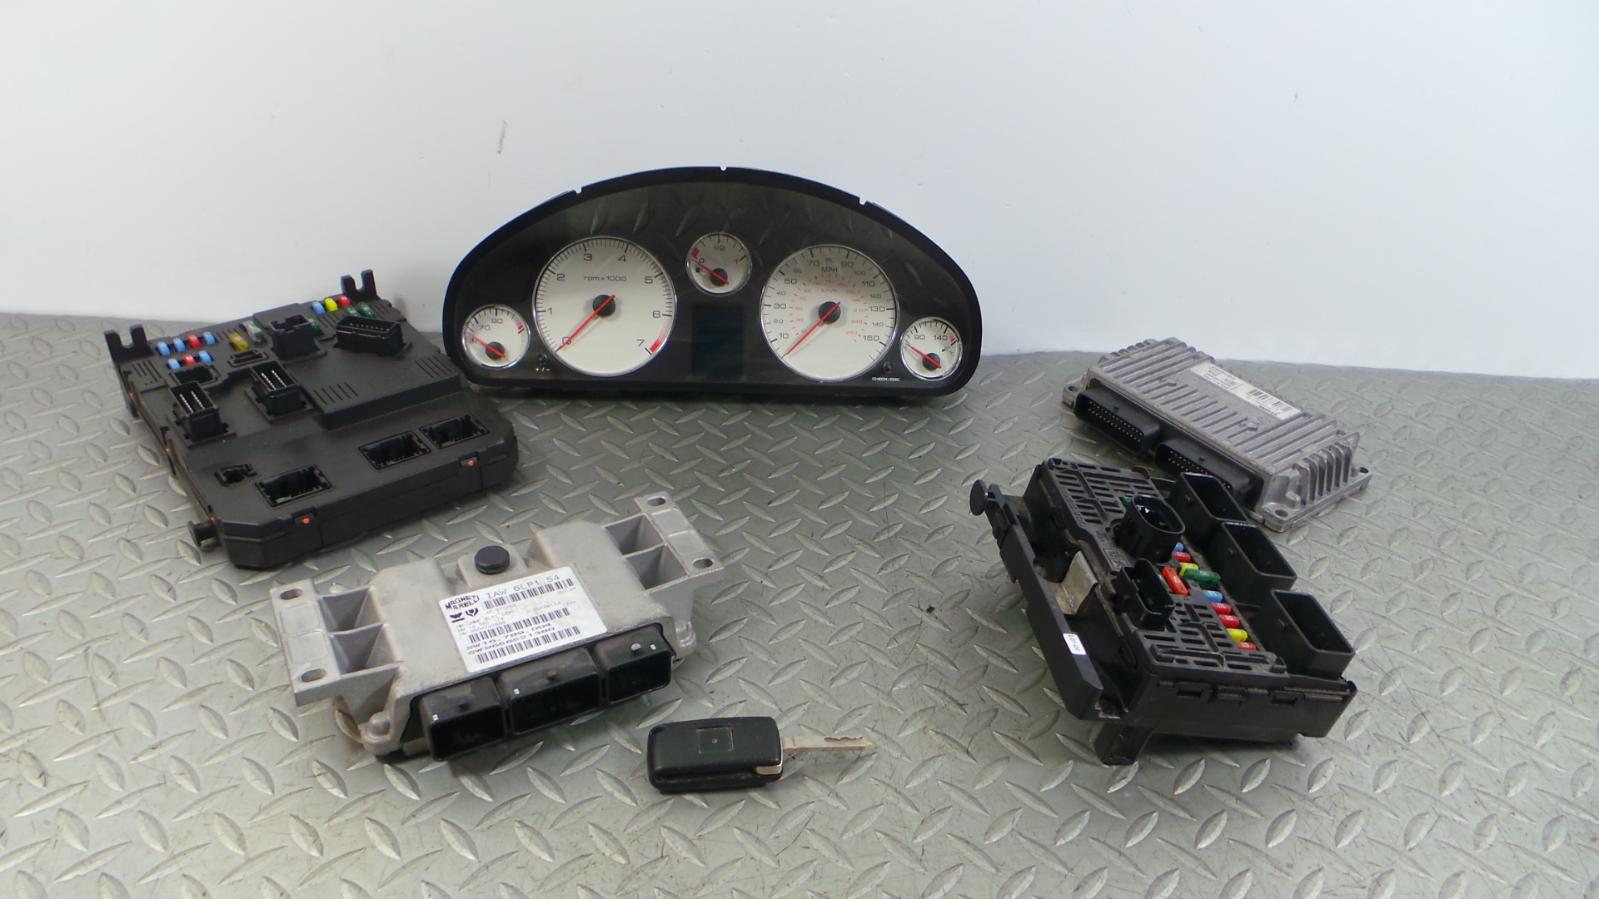 2005 peugeot 407 2 0 essence ecu bsi kit lock set iaw 058 ebay. Black Bedroom Furniture Sets. Home Design Ideas